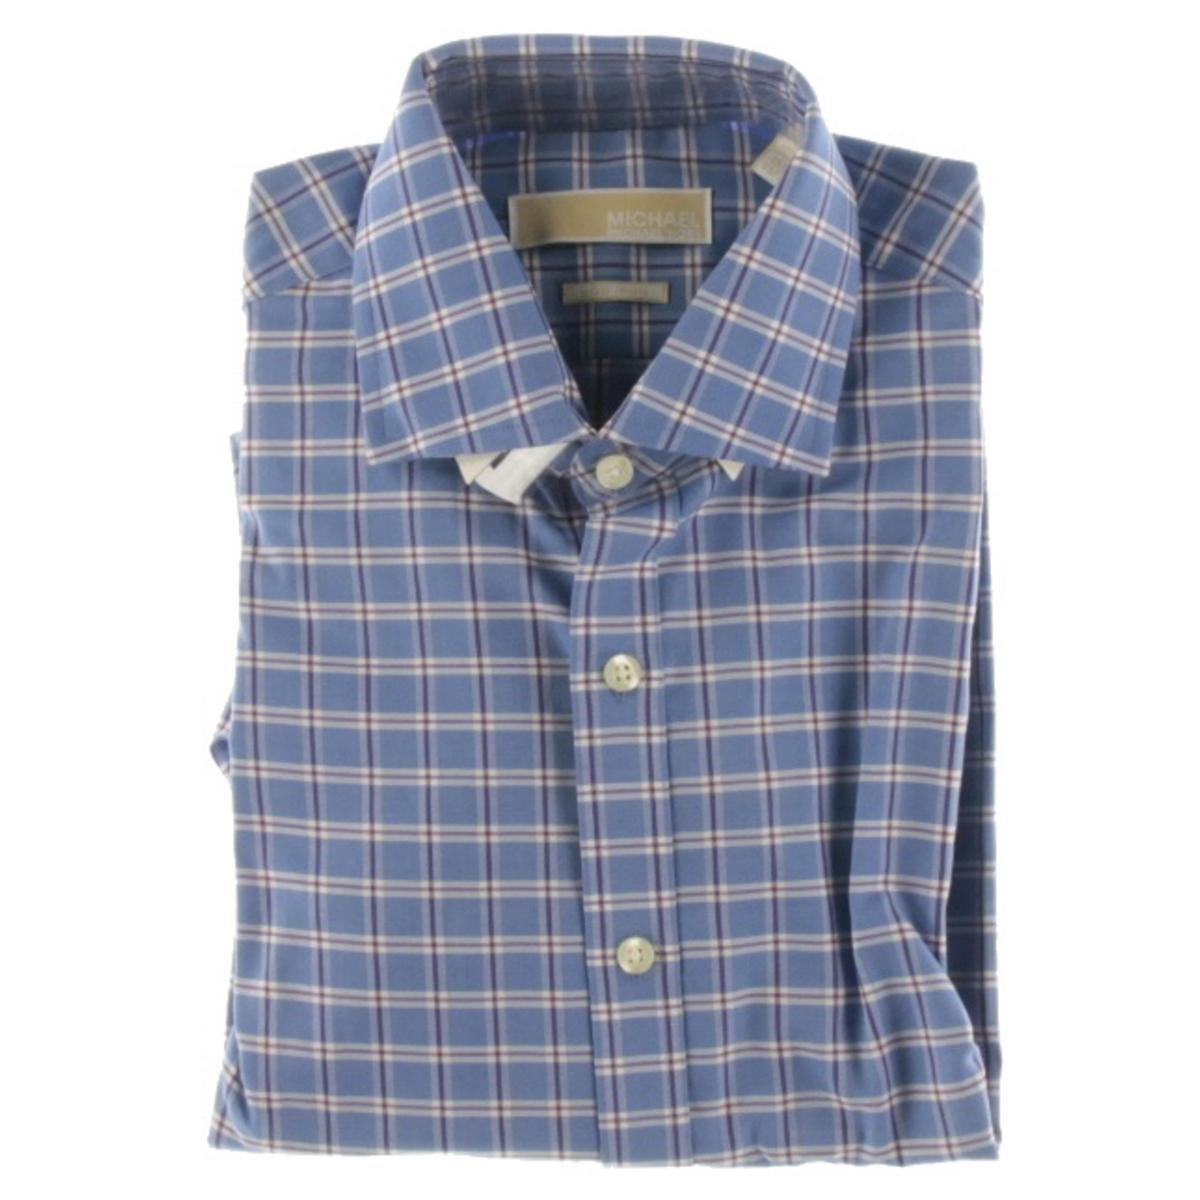 Michael Michael Kors Mens Non Iron Checkered Dress Shirt Blue At